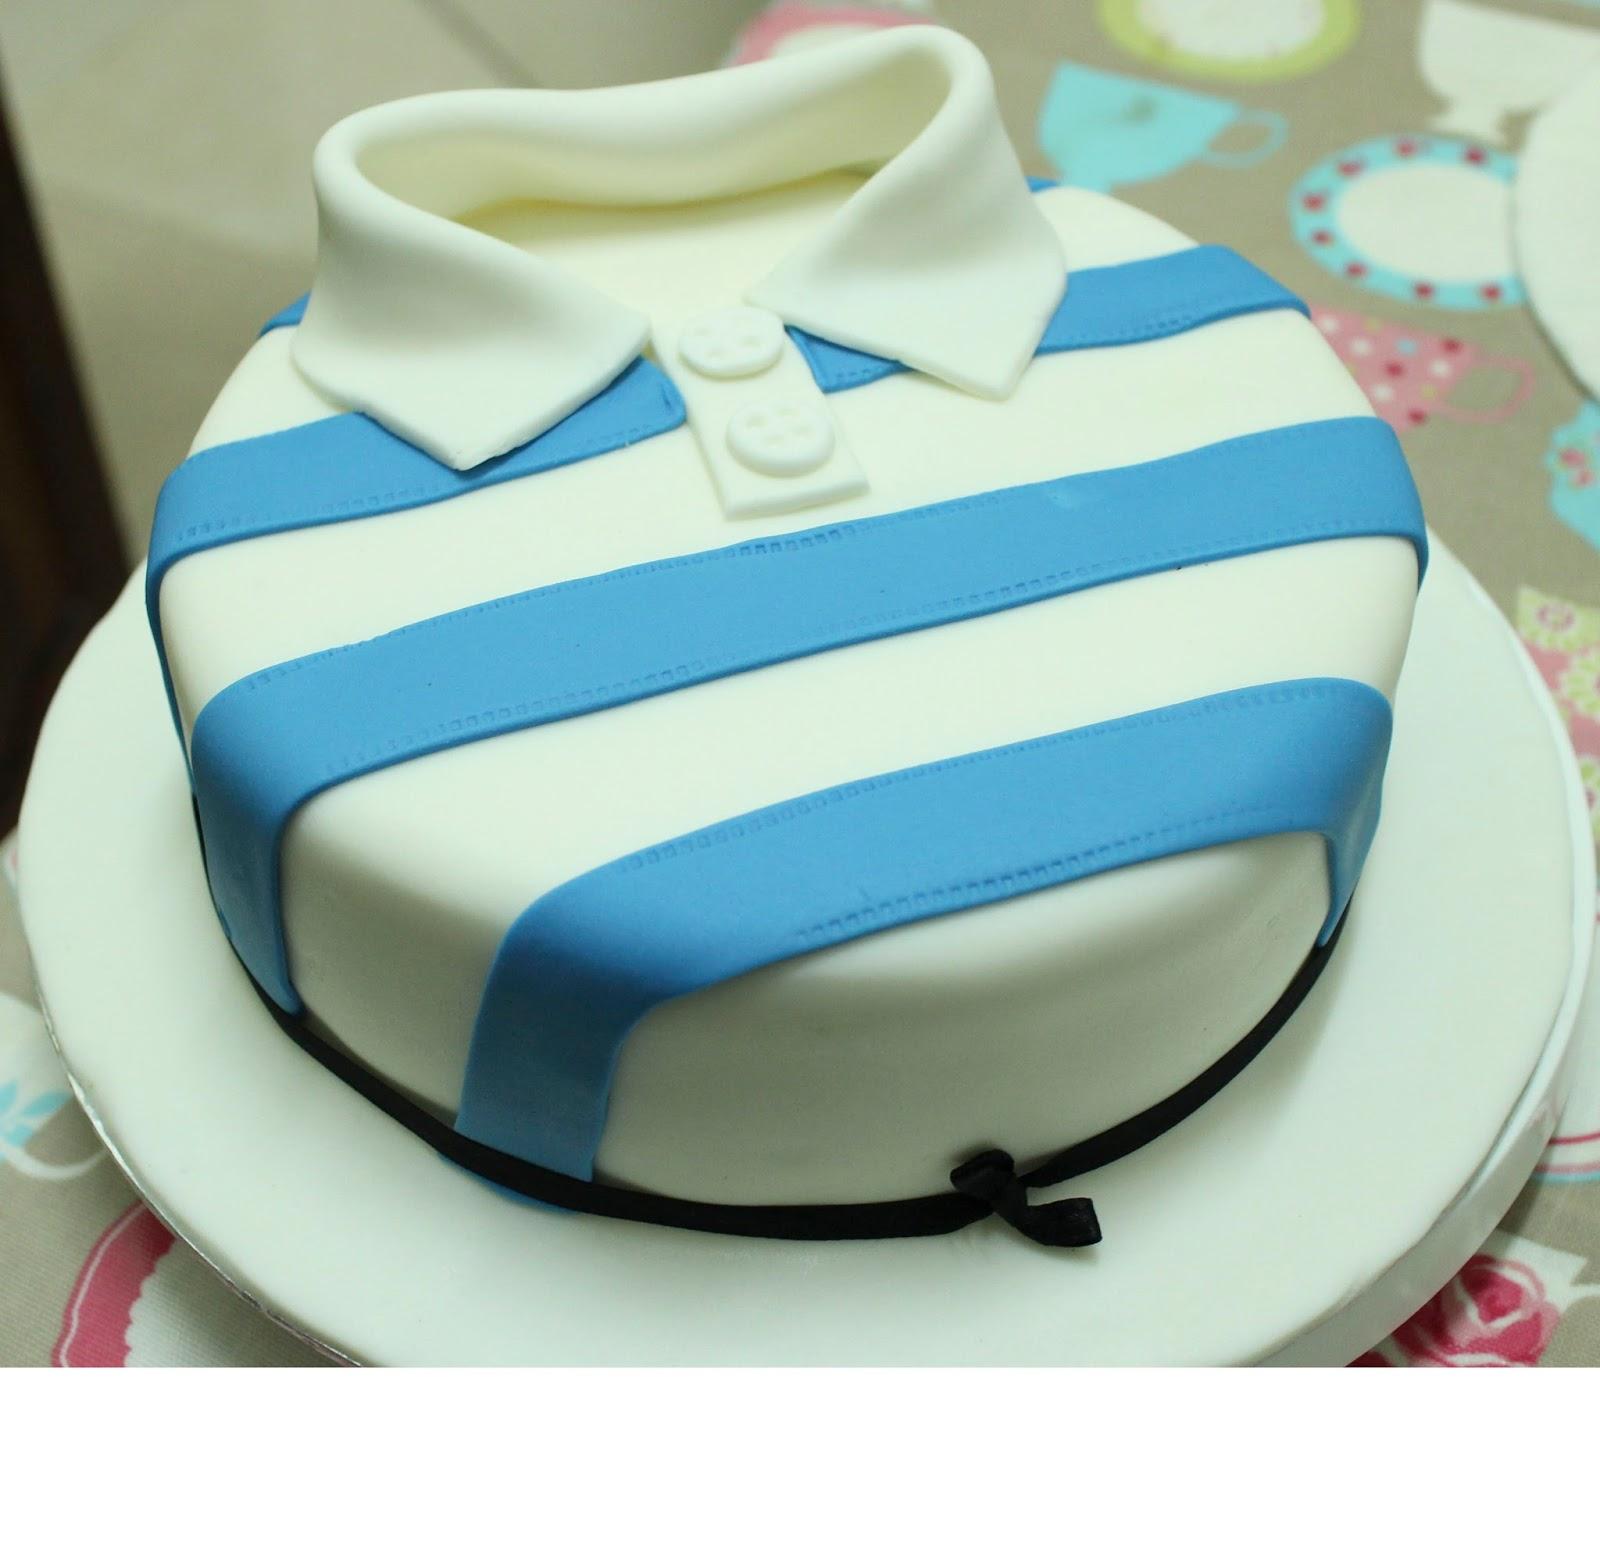 Cupcakes Birthday Cakes Engagement Cakes Wedding Cakes Polo